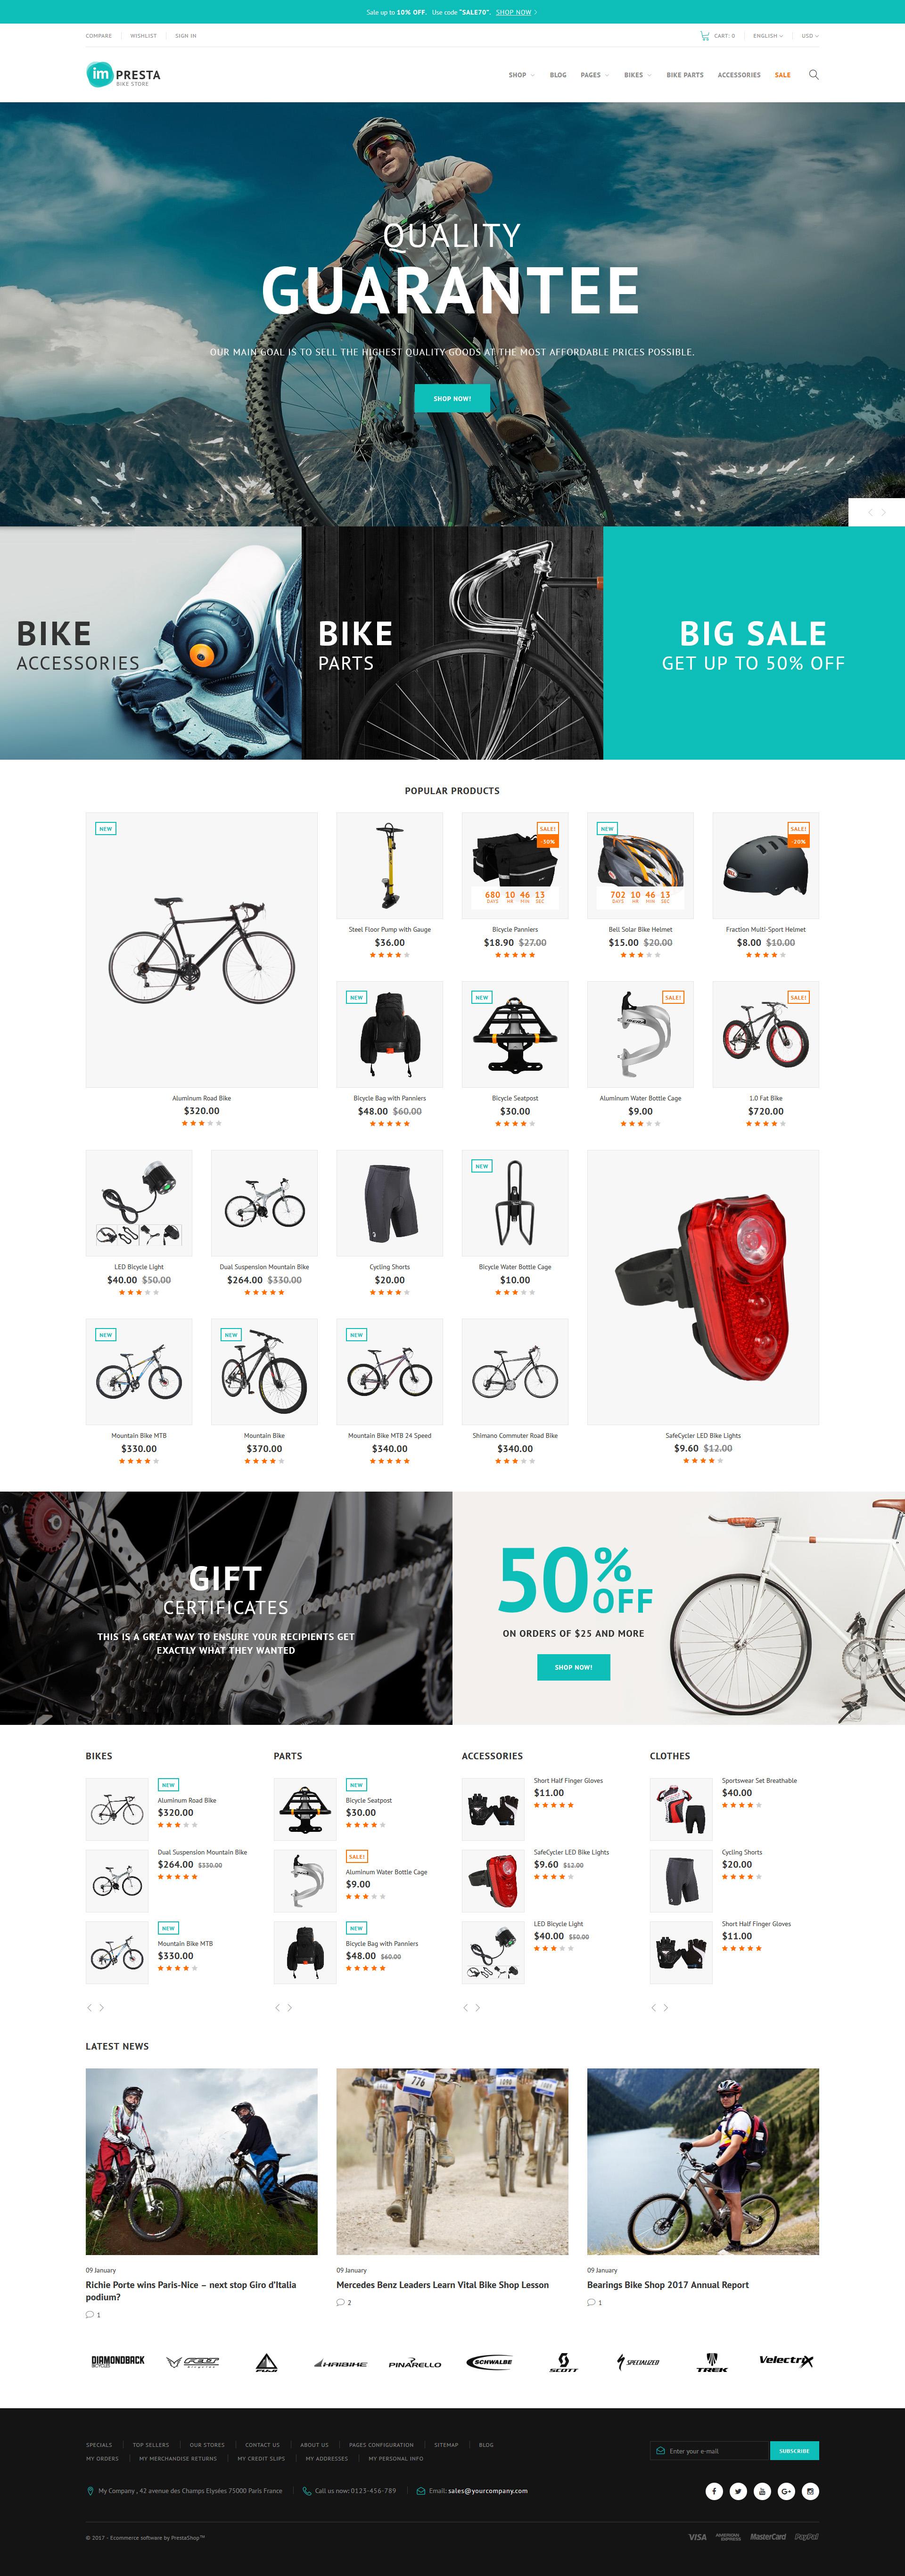 Responsywny szablon PrestaShop Impresta - Bike Store #64382 - zrzut ekranu